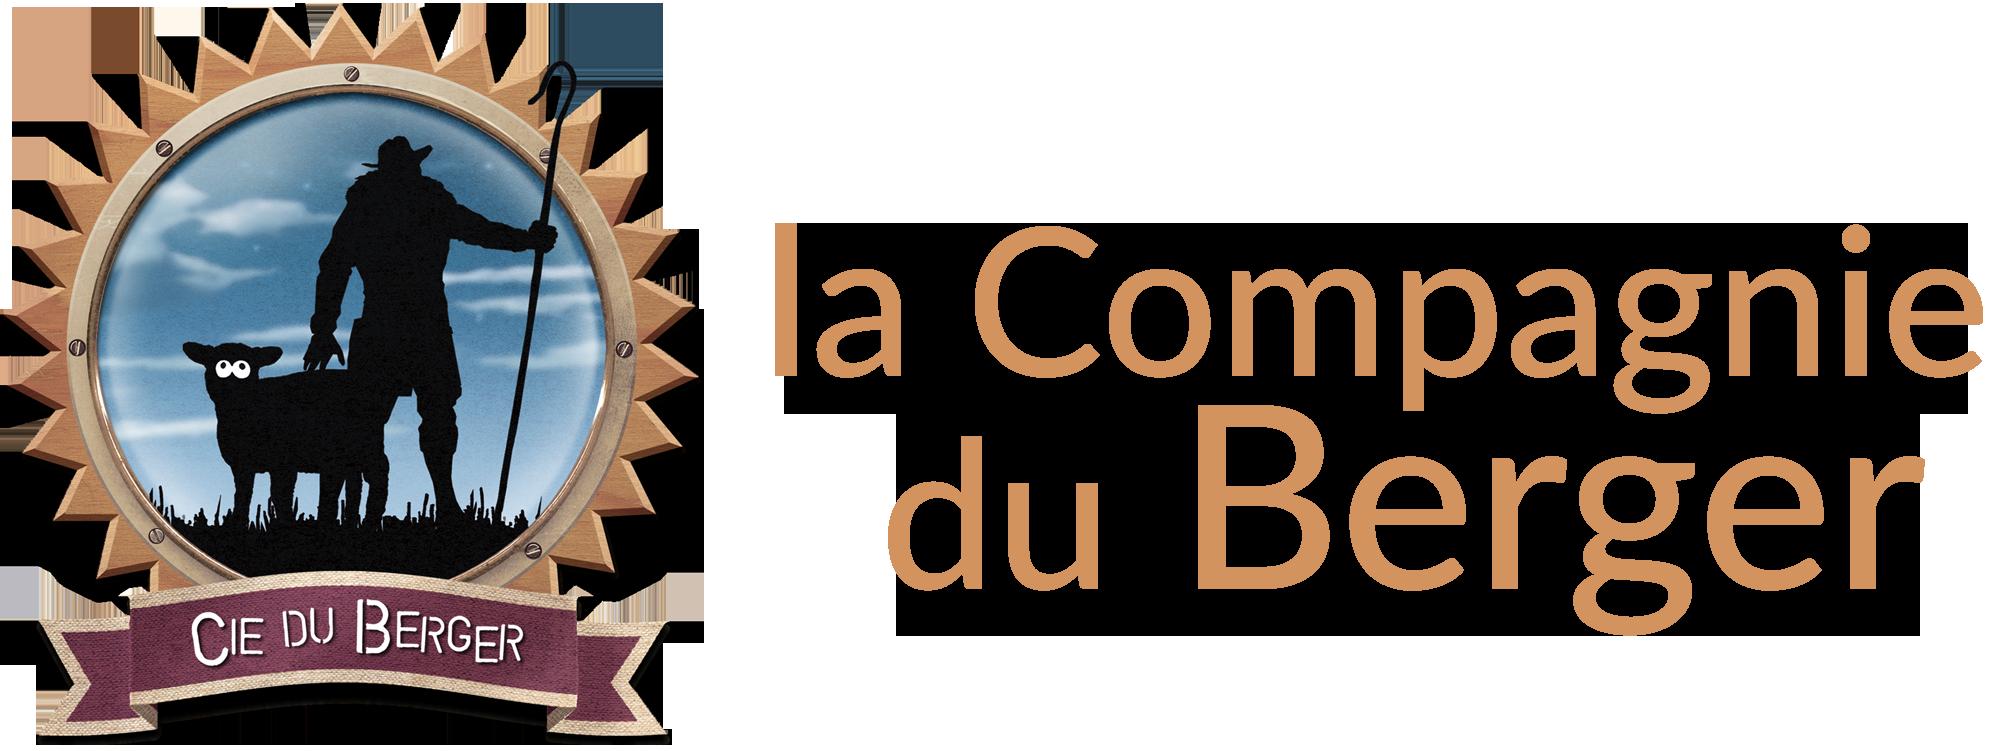 Compagnie du Berger